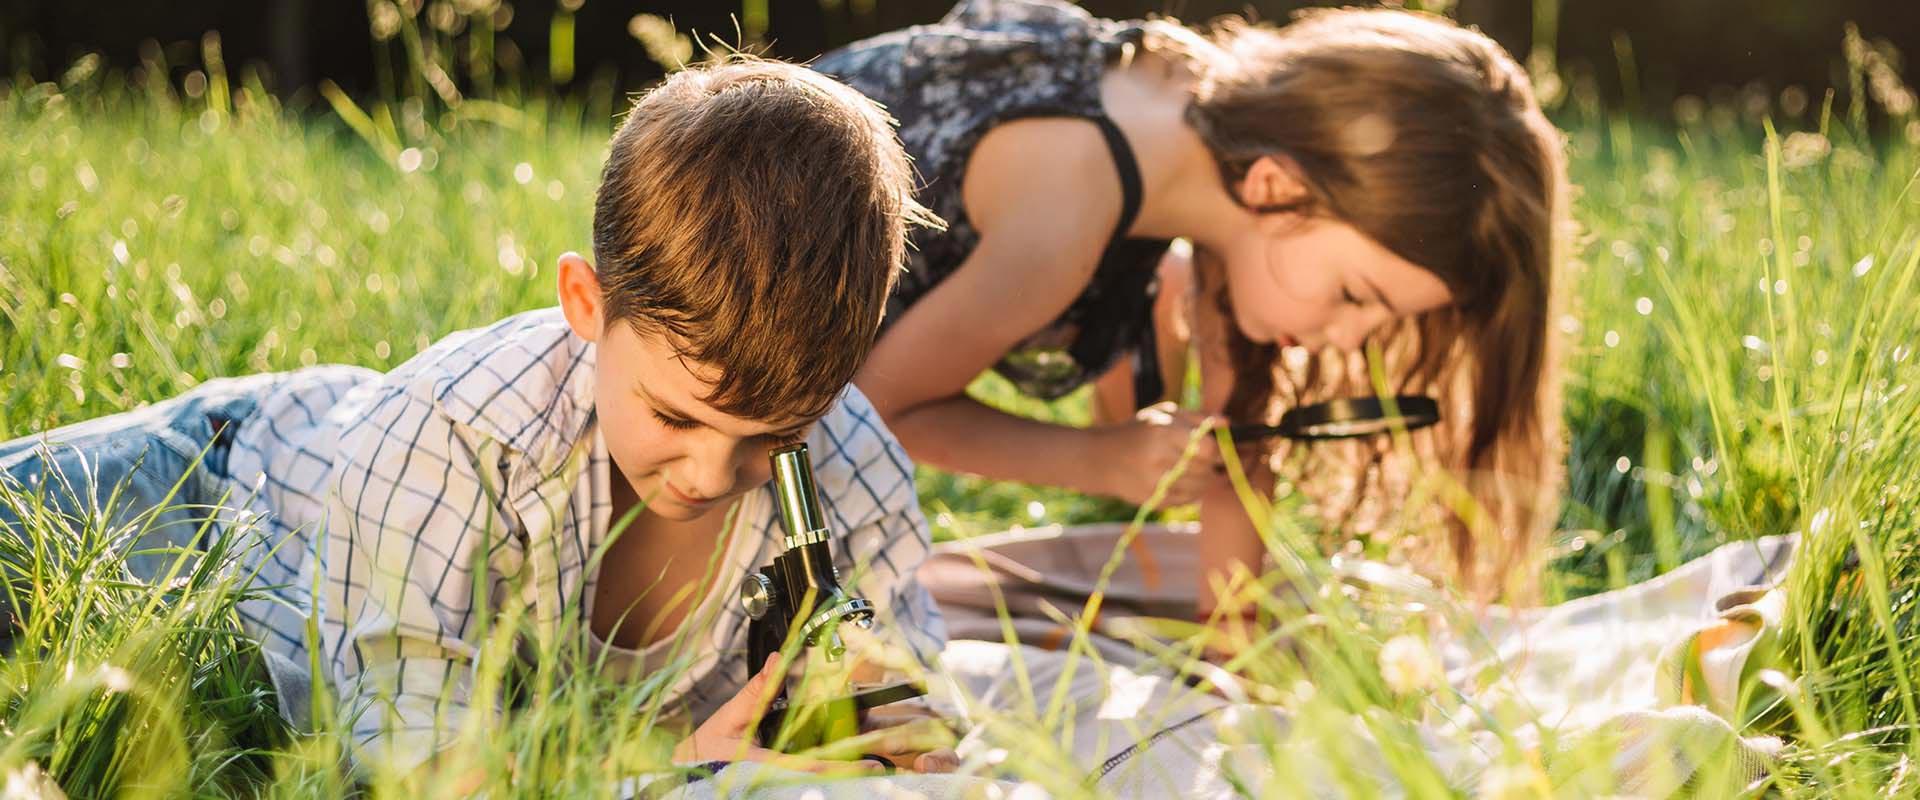 Dare County Schools Calendar 2020 And 2021 – Publicholidays For Dare County School Calendar 2021